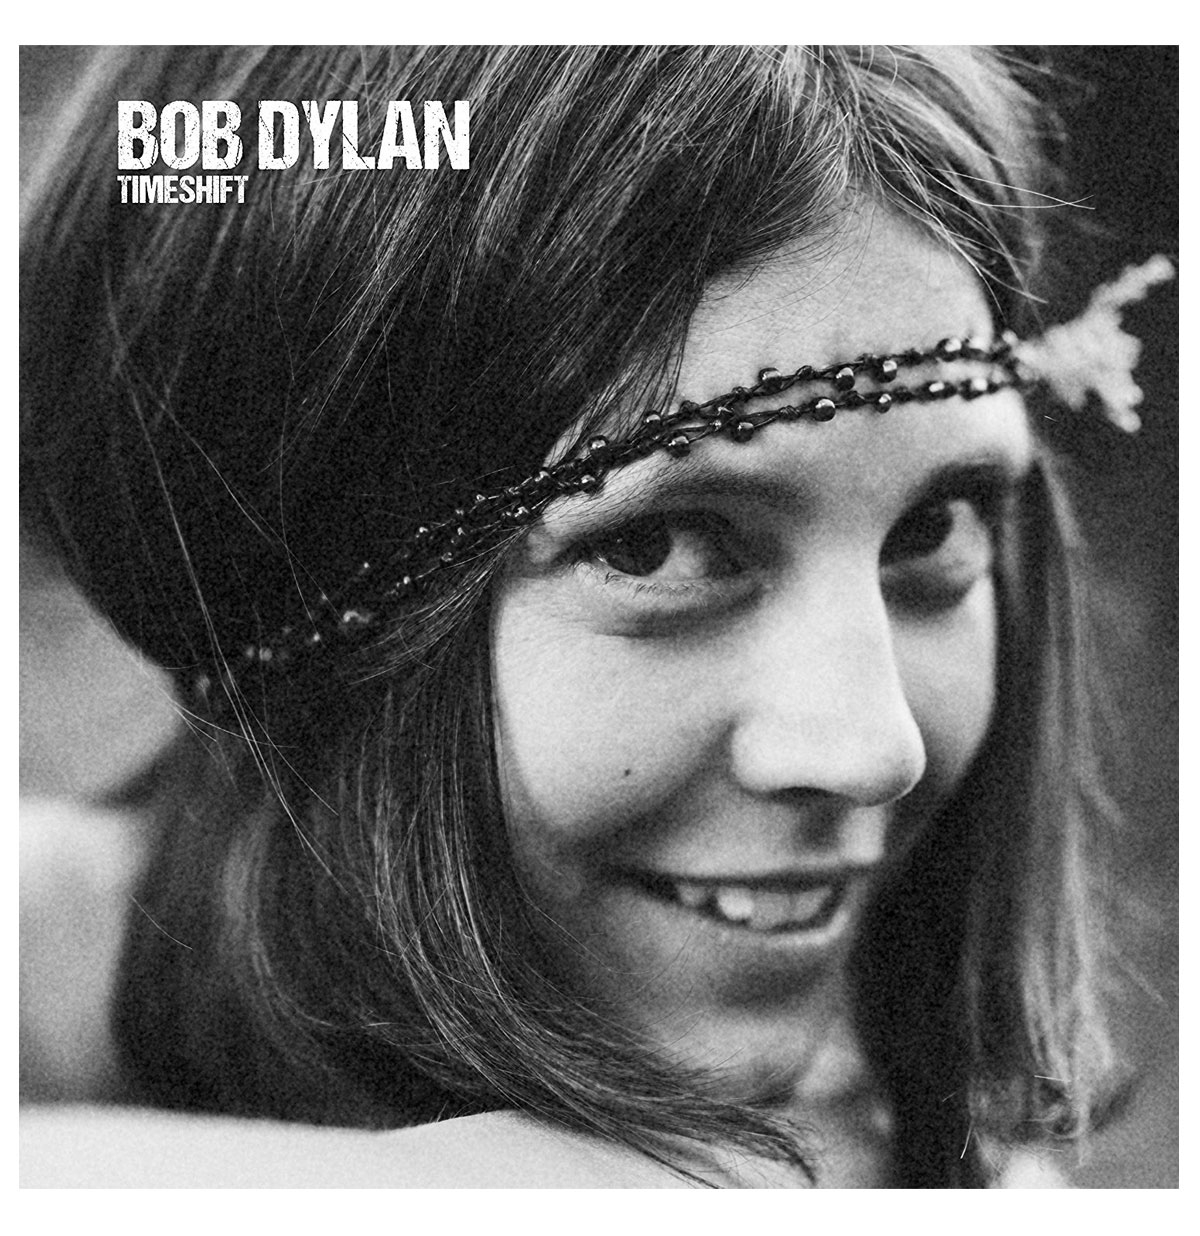 Bob Dylan - Timeshift LP